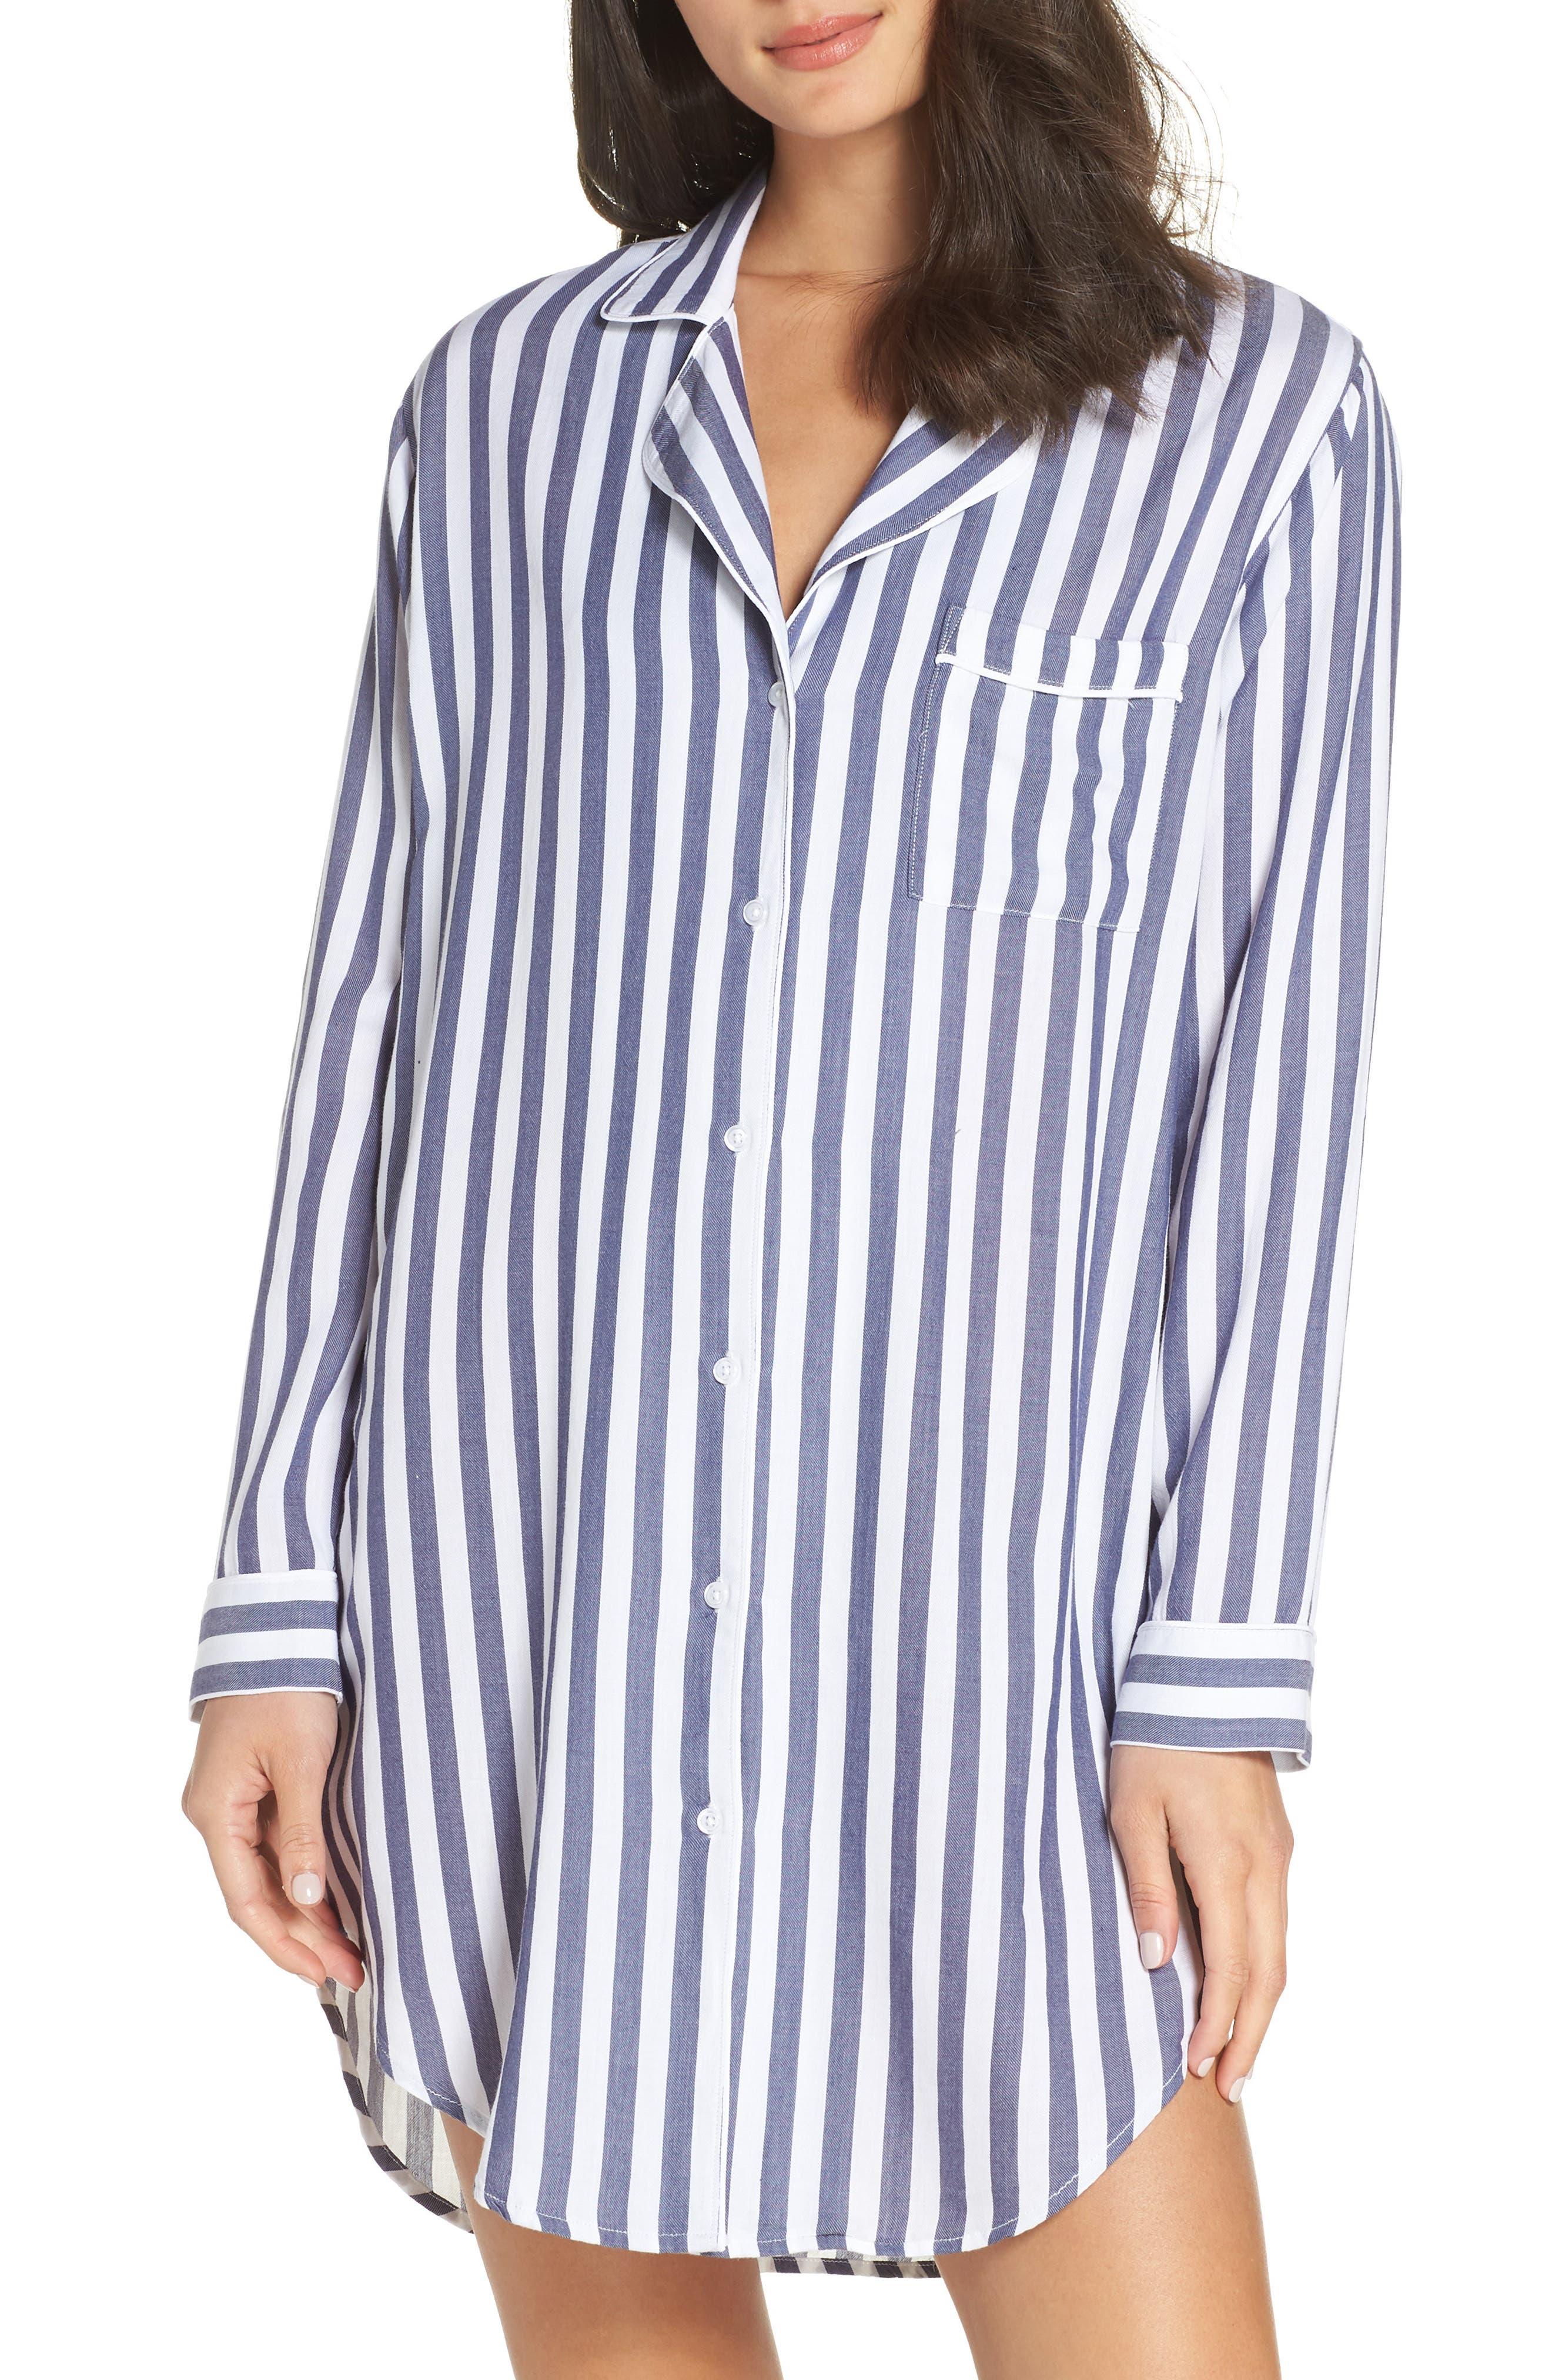 RAILS Striped Sleep Shirt, Main, color, 434